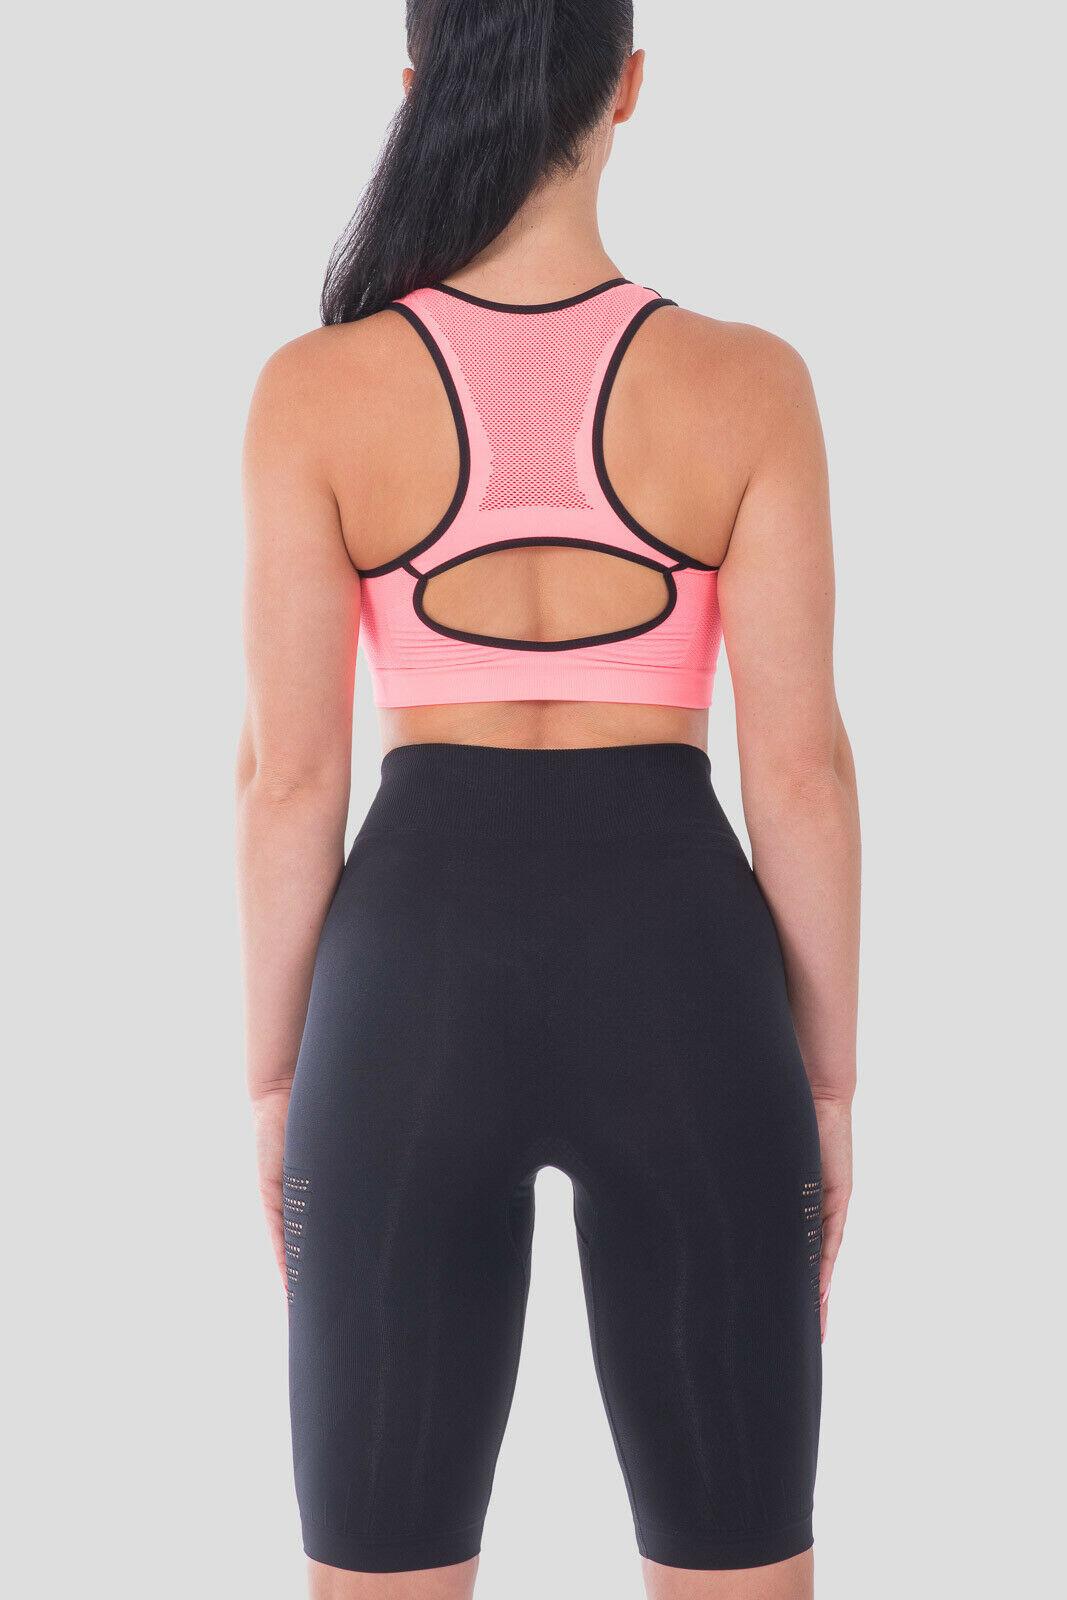 Bellissima-Women-039-s-Sport-Bra-Running-Yoga-Workout-Fitness-Racerback-Seamless thumbnail 57